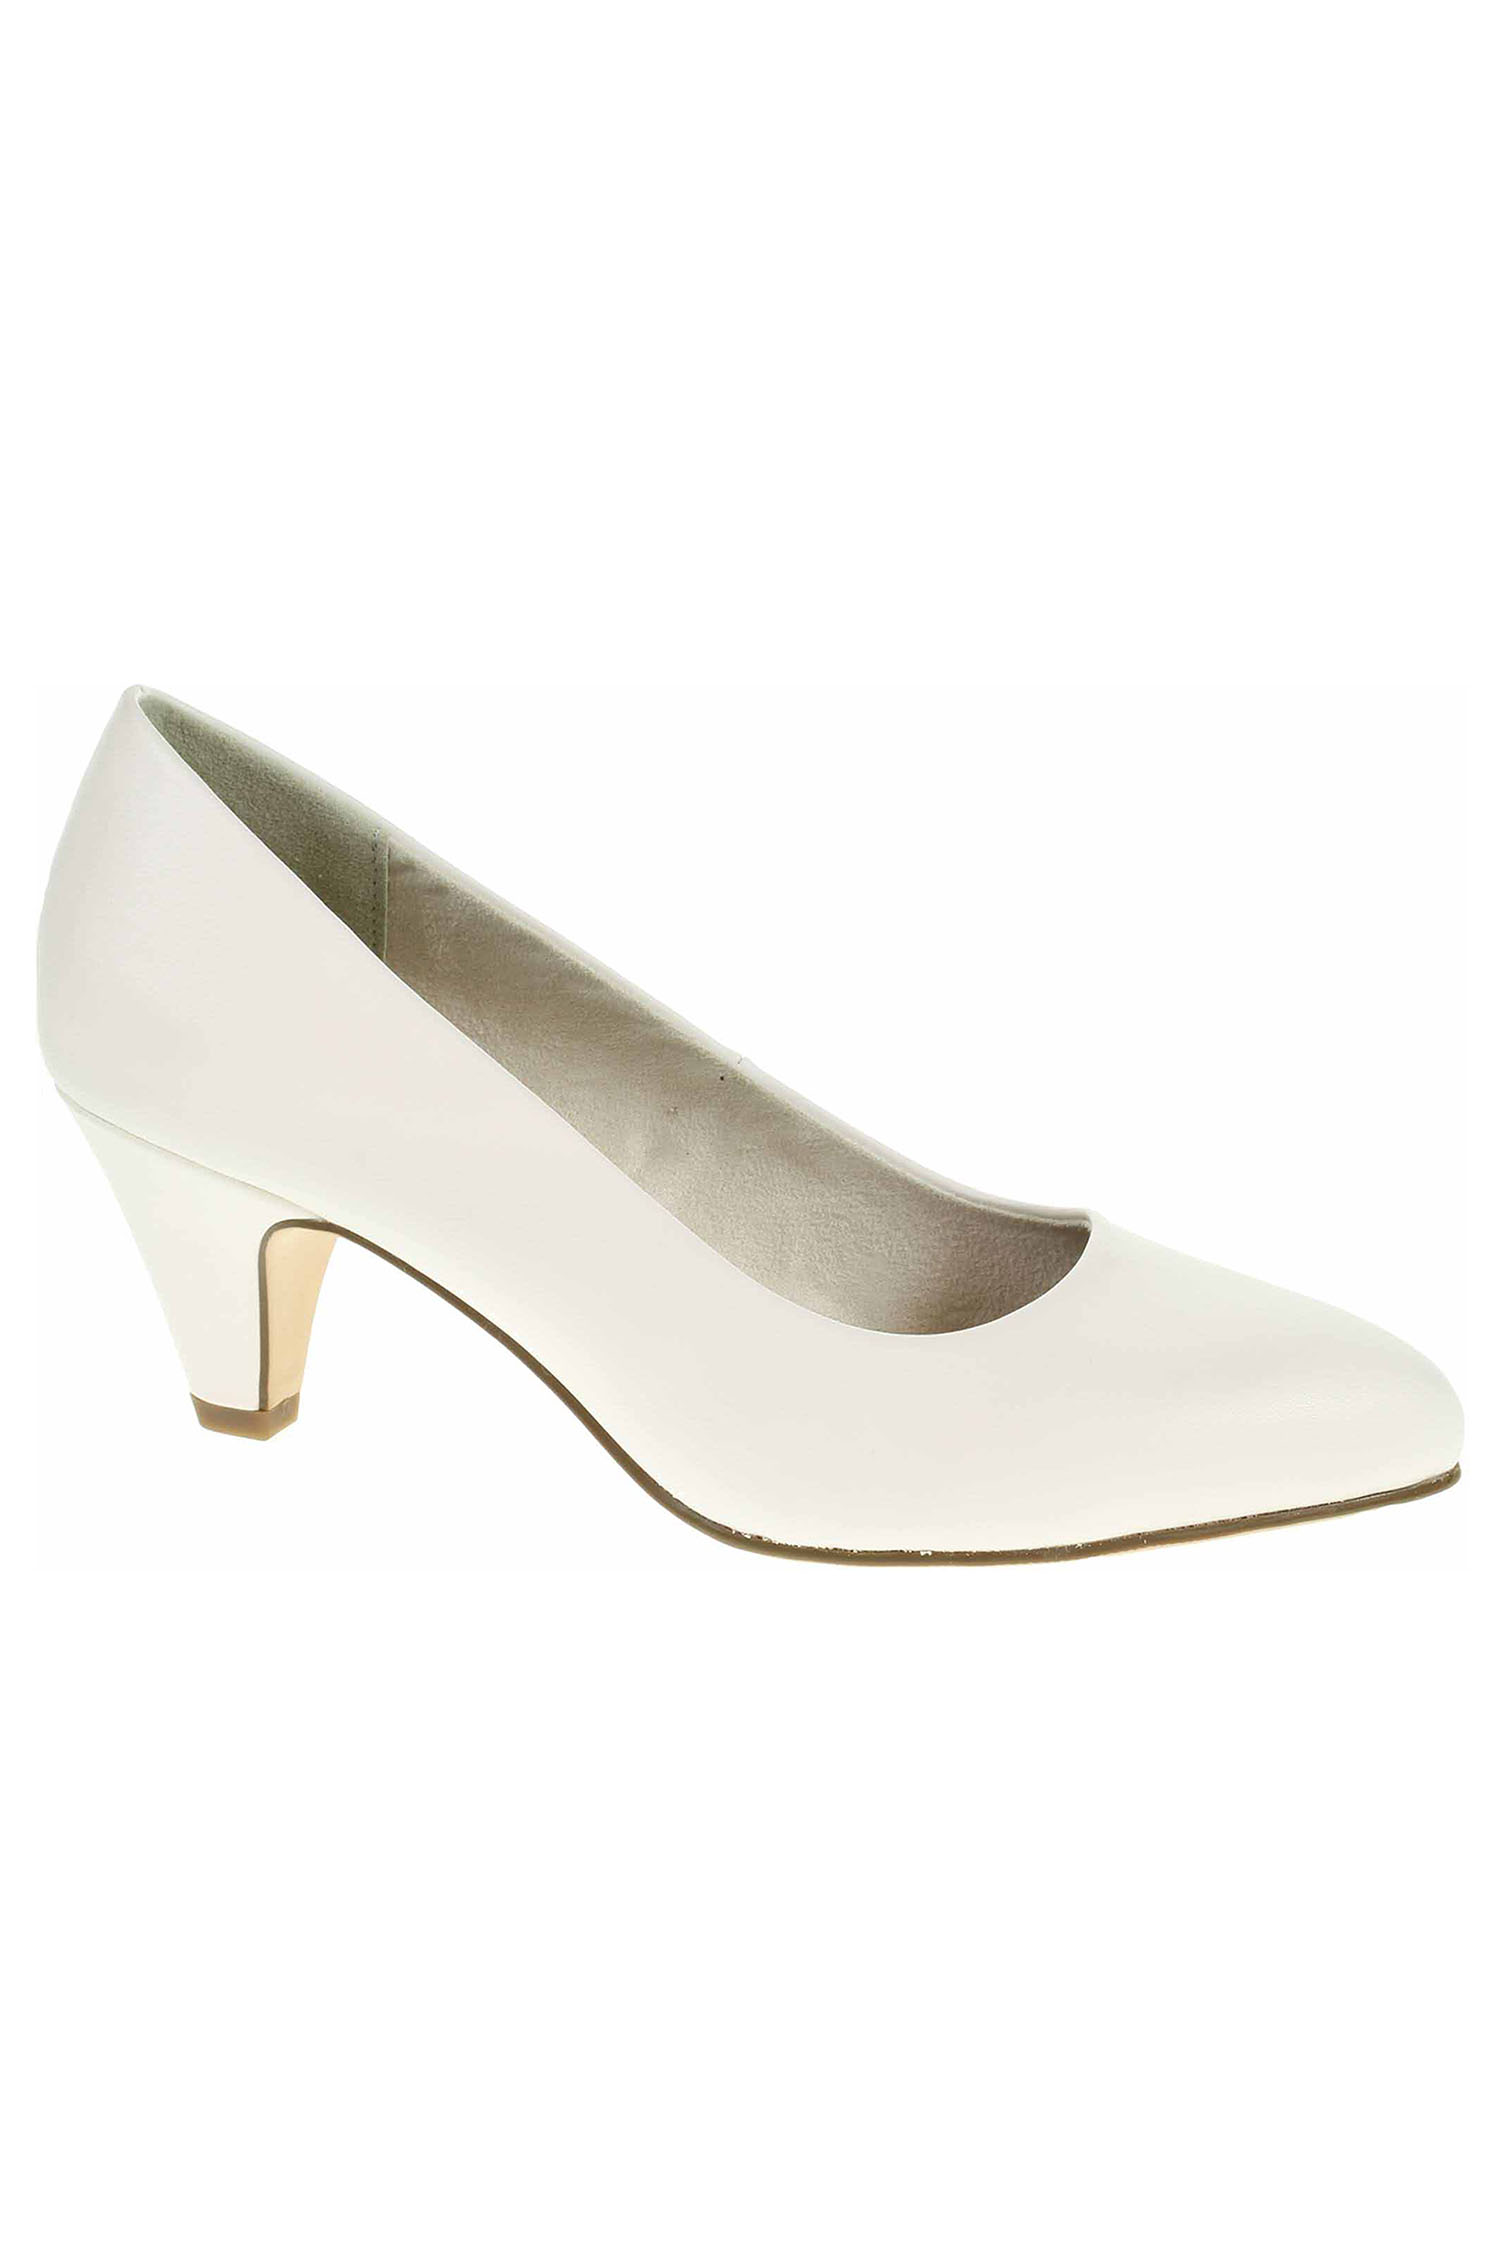 2c44d7325fa9b Dámská společenská obuv Tamaris lodičky 1-22416-21 108 white matt 1-1. 1